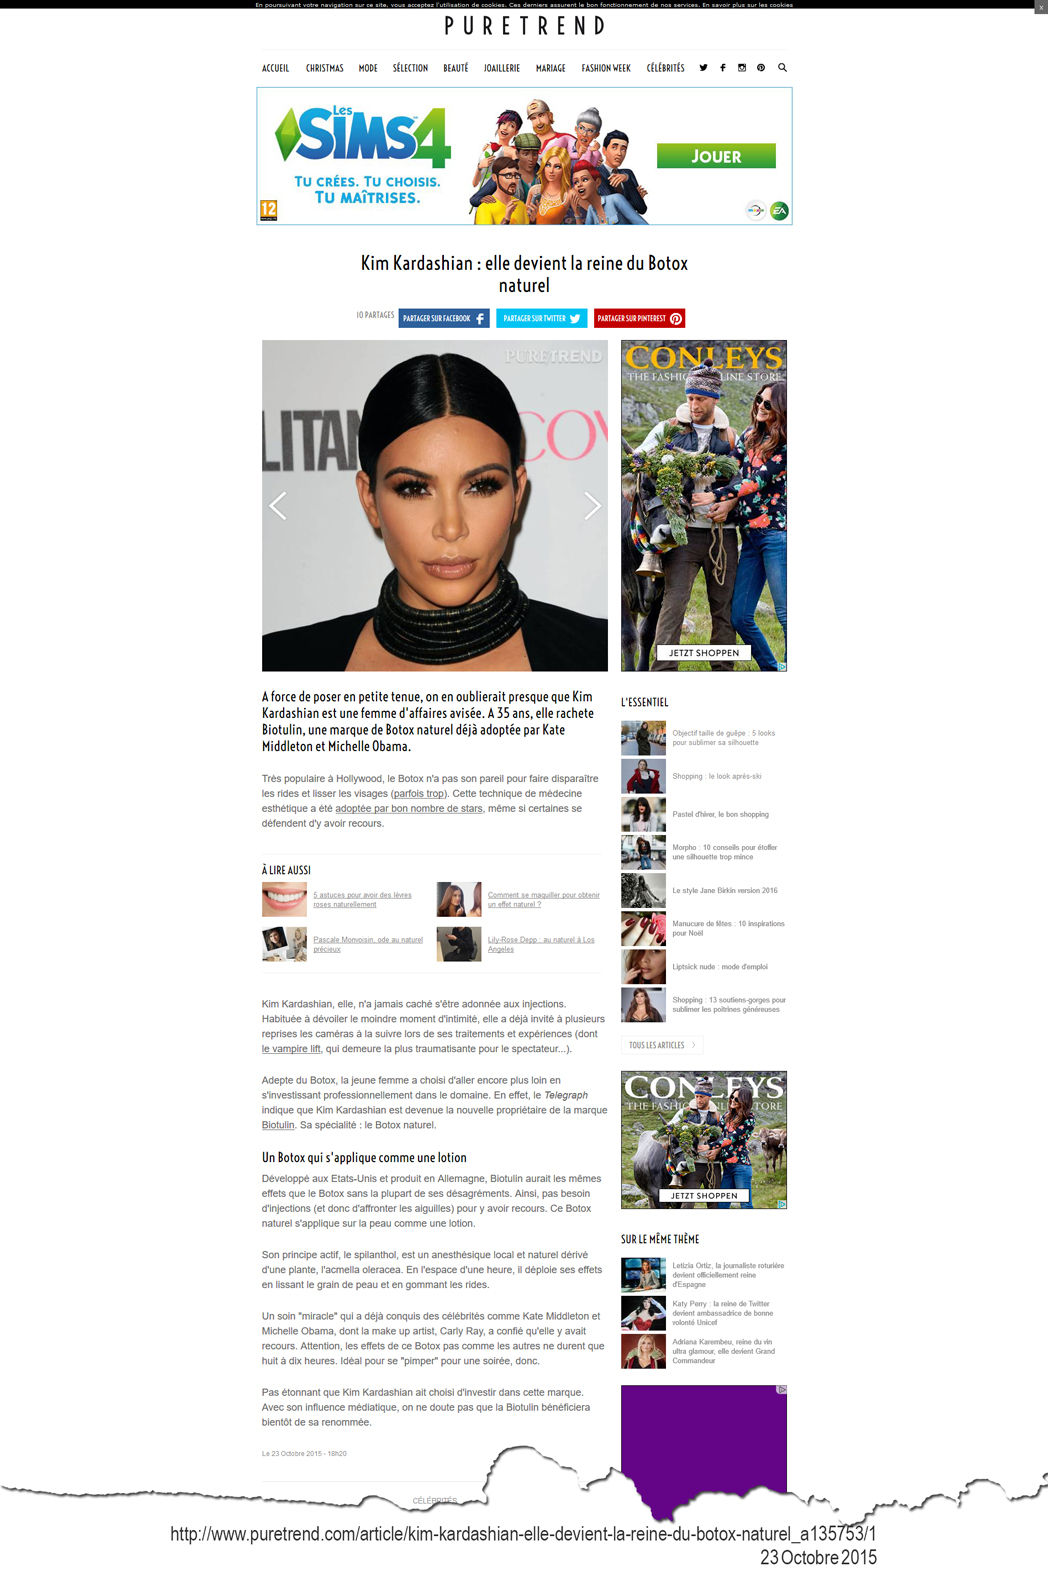 Kim Kardashian Biotulin